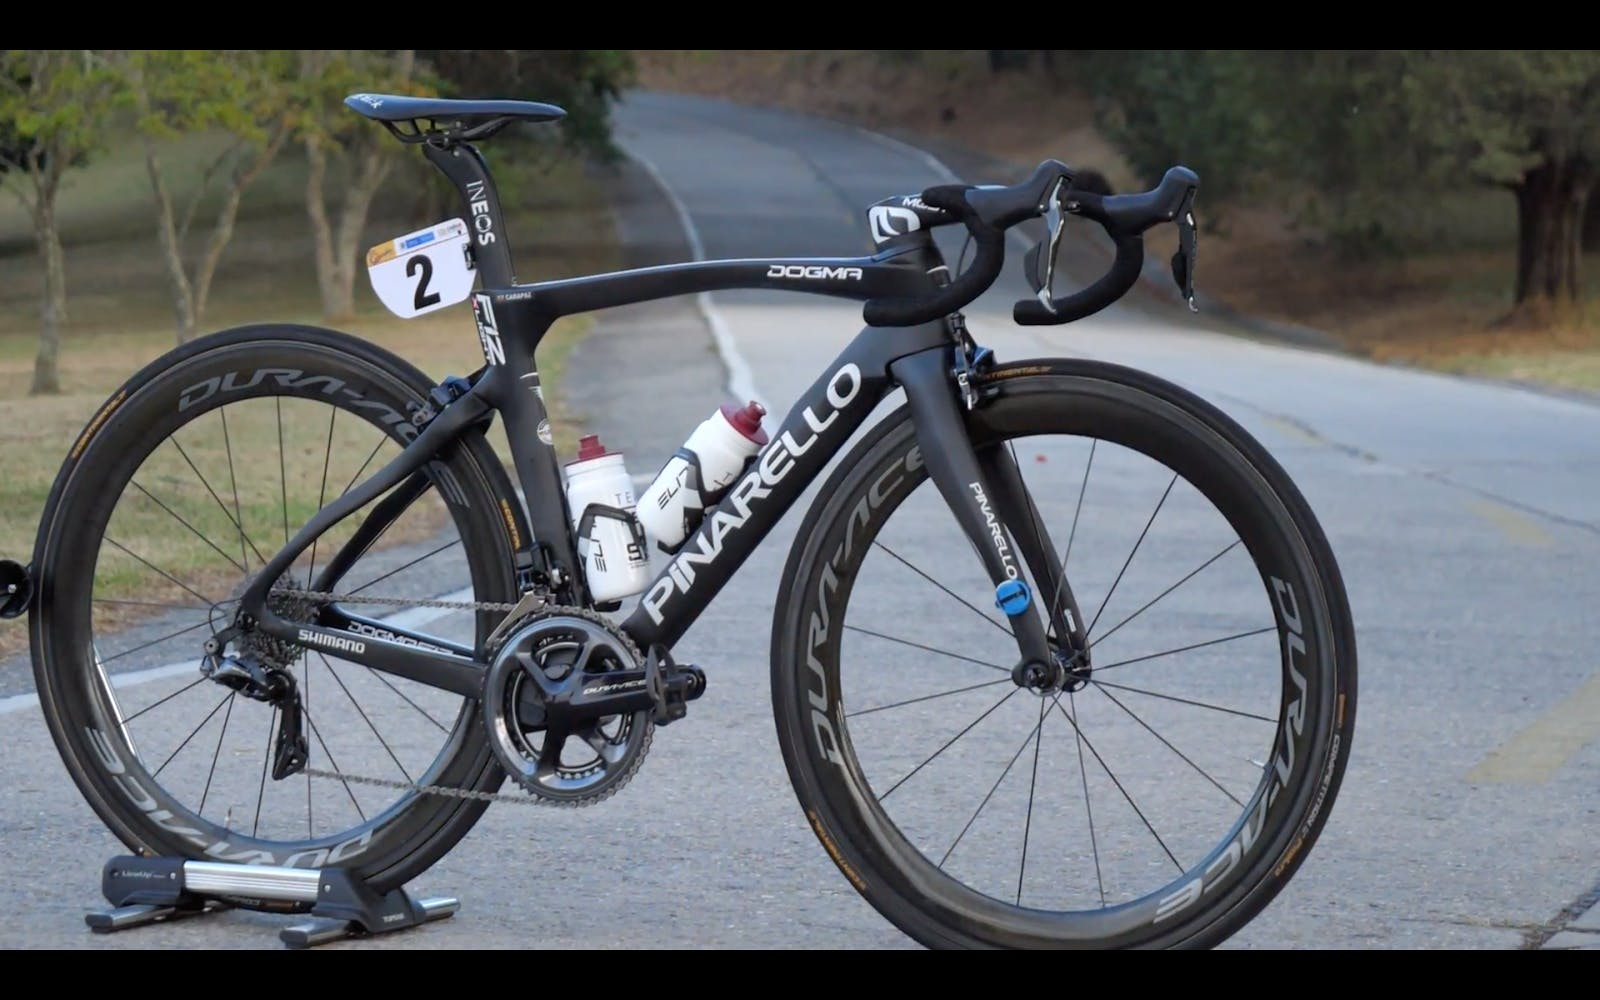 Richard Carapaz's Pro Bike